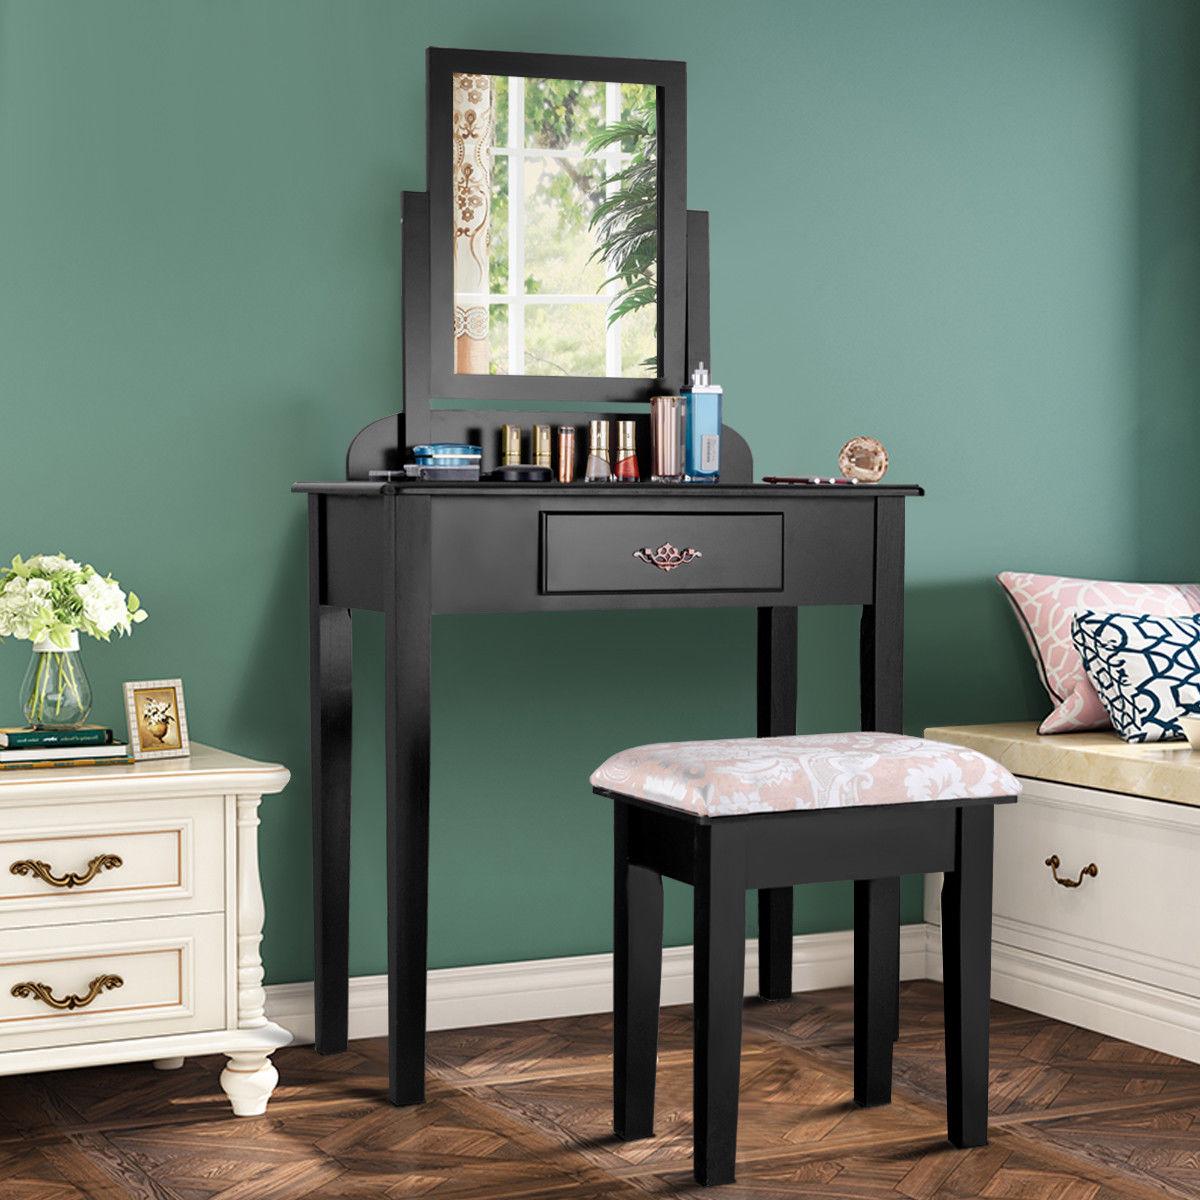 Costway Makeup Desk Vanity Dressing Table Set W/Square Mirror Stool 1 Large Drawer Black